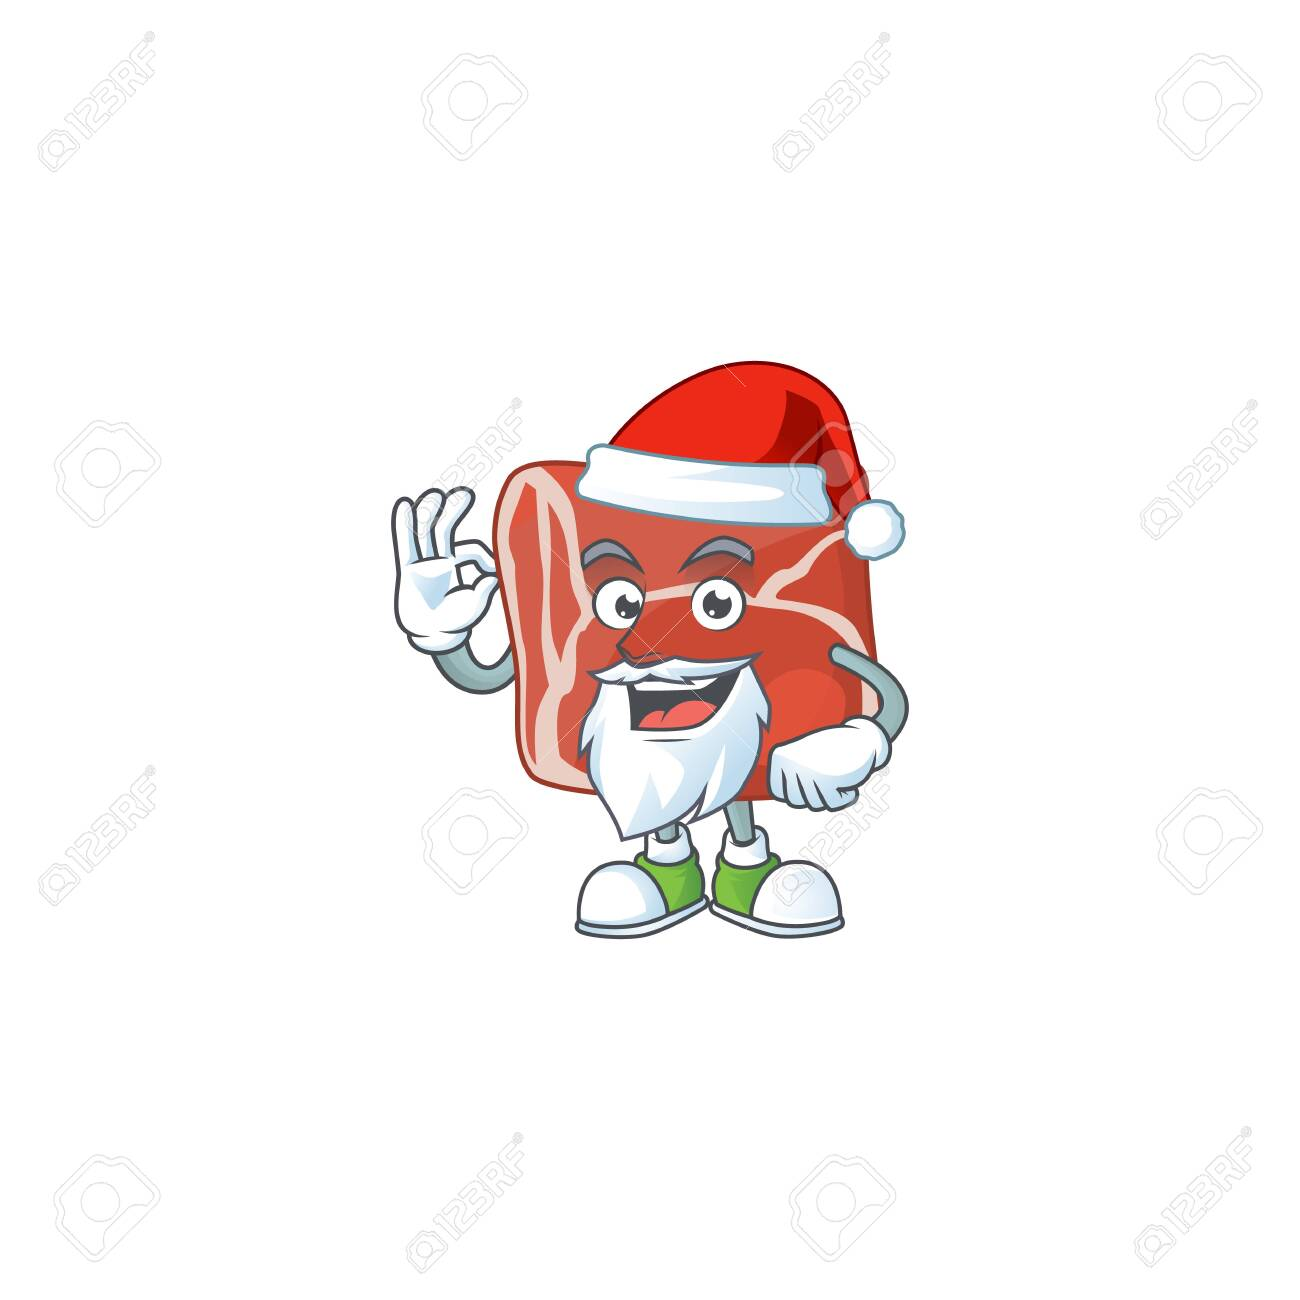 Beef cartoon character of Santa showing ok finger. Vector illustration - 142153256